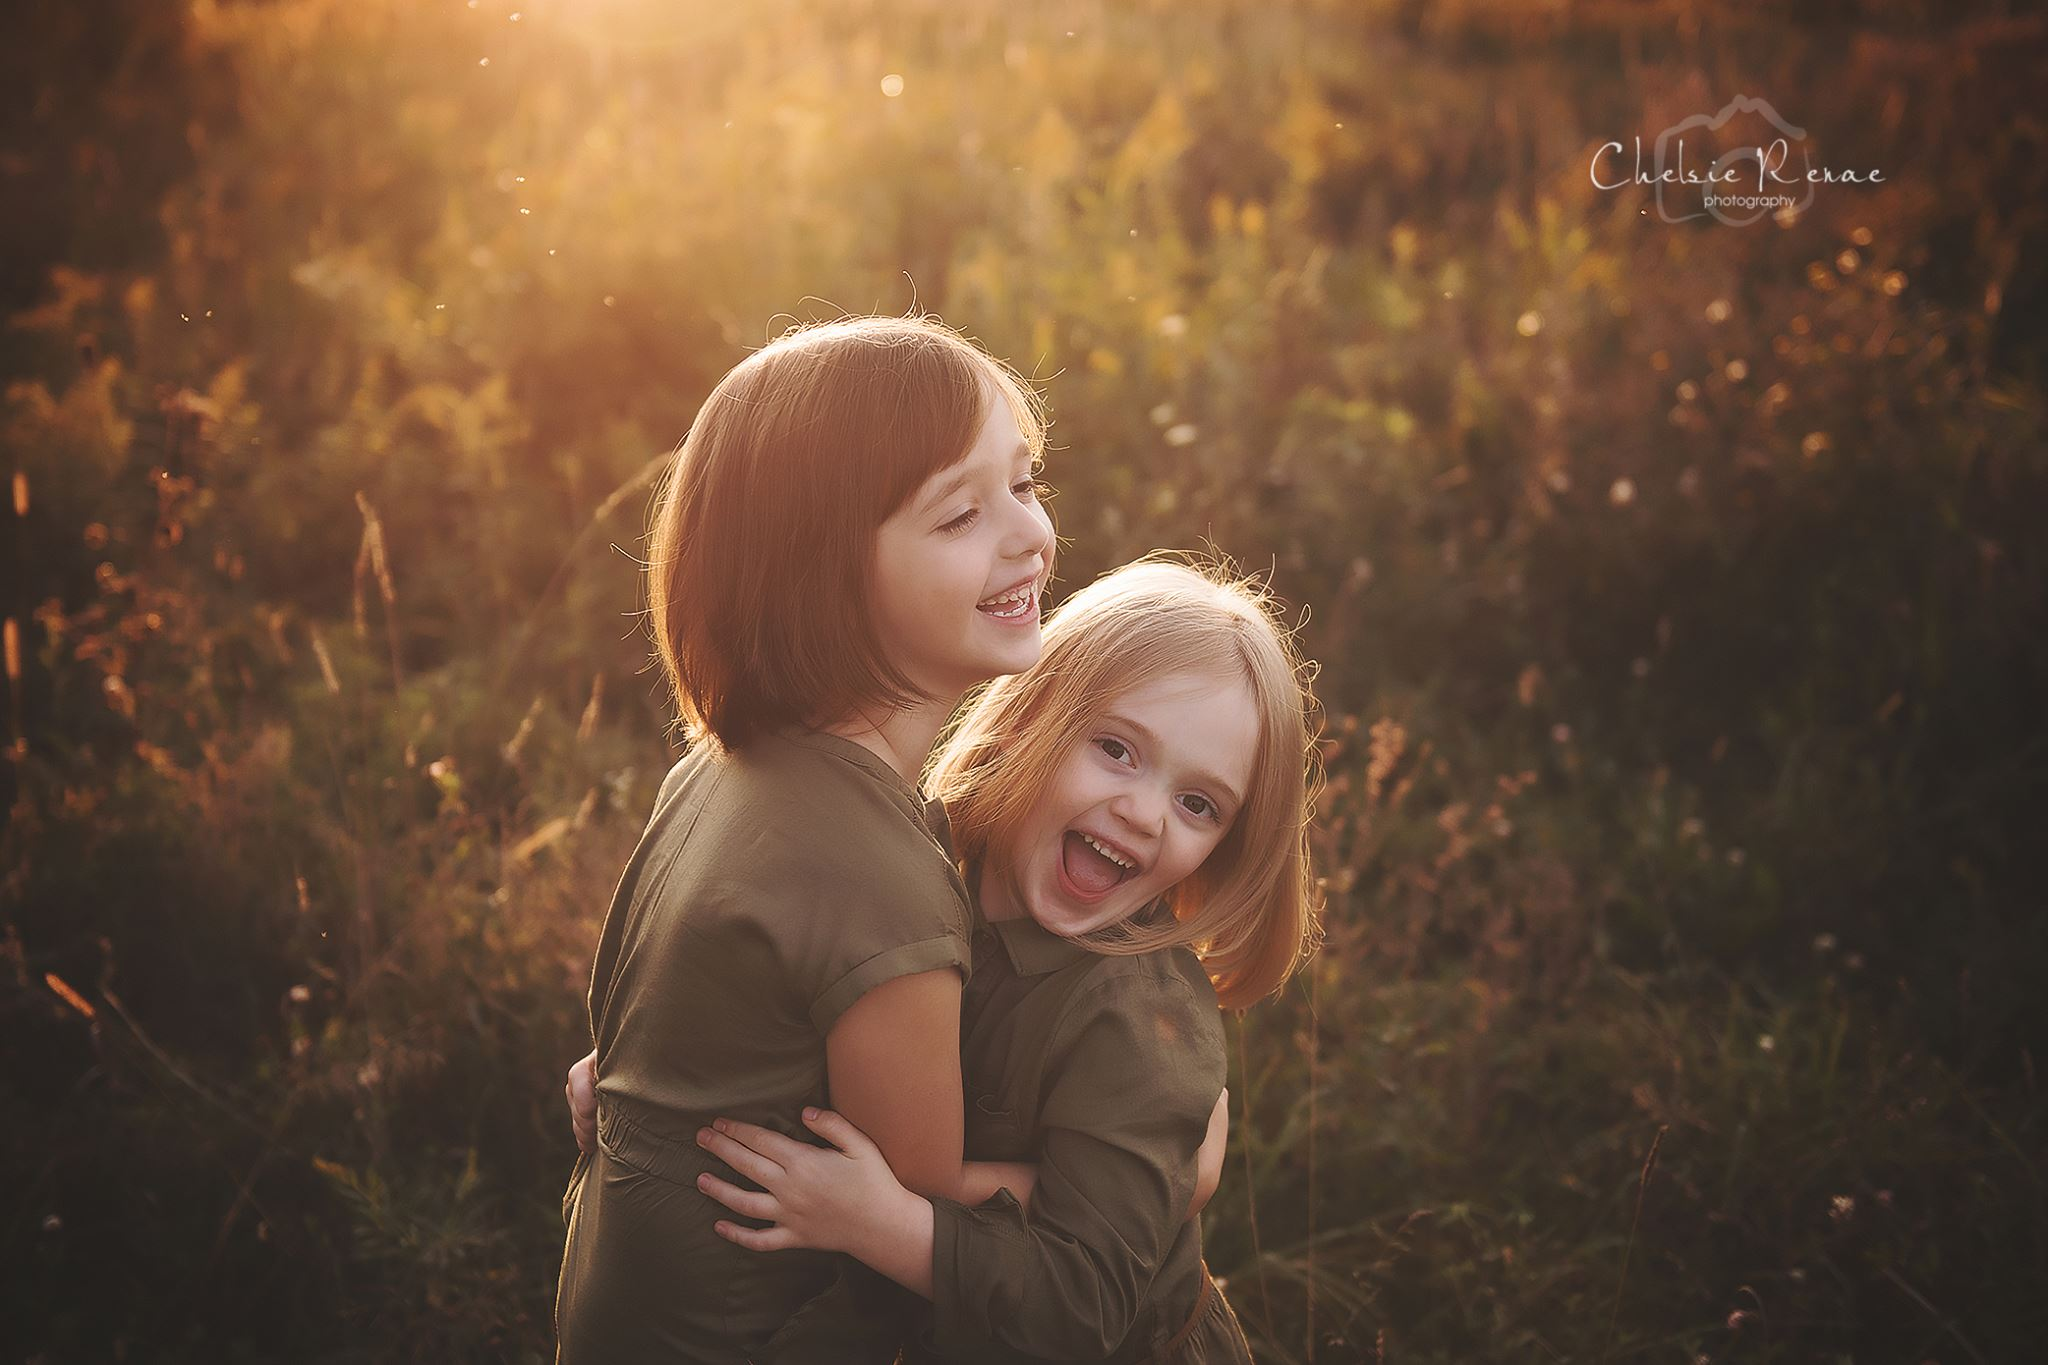 sister hugging in beatiful golden light